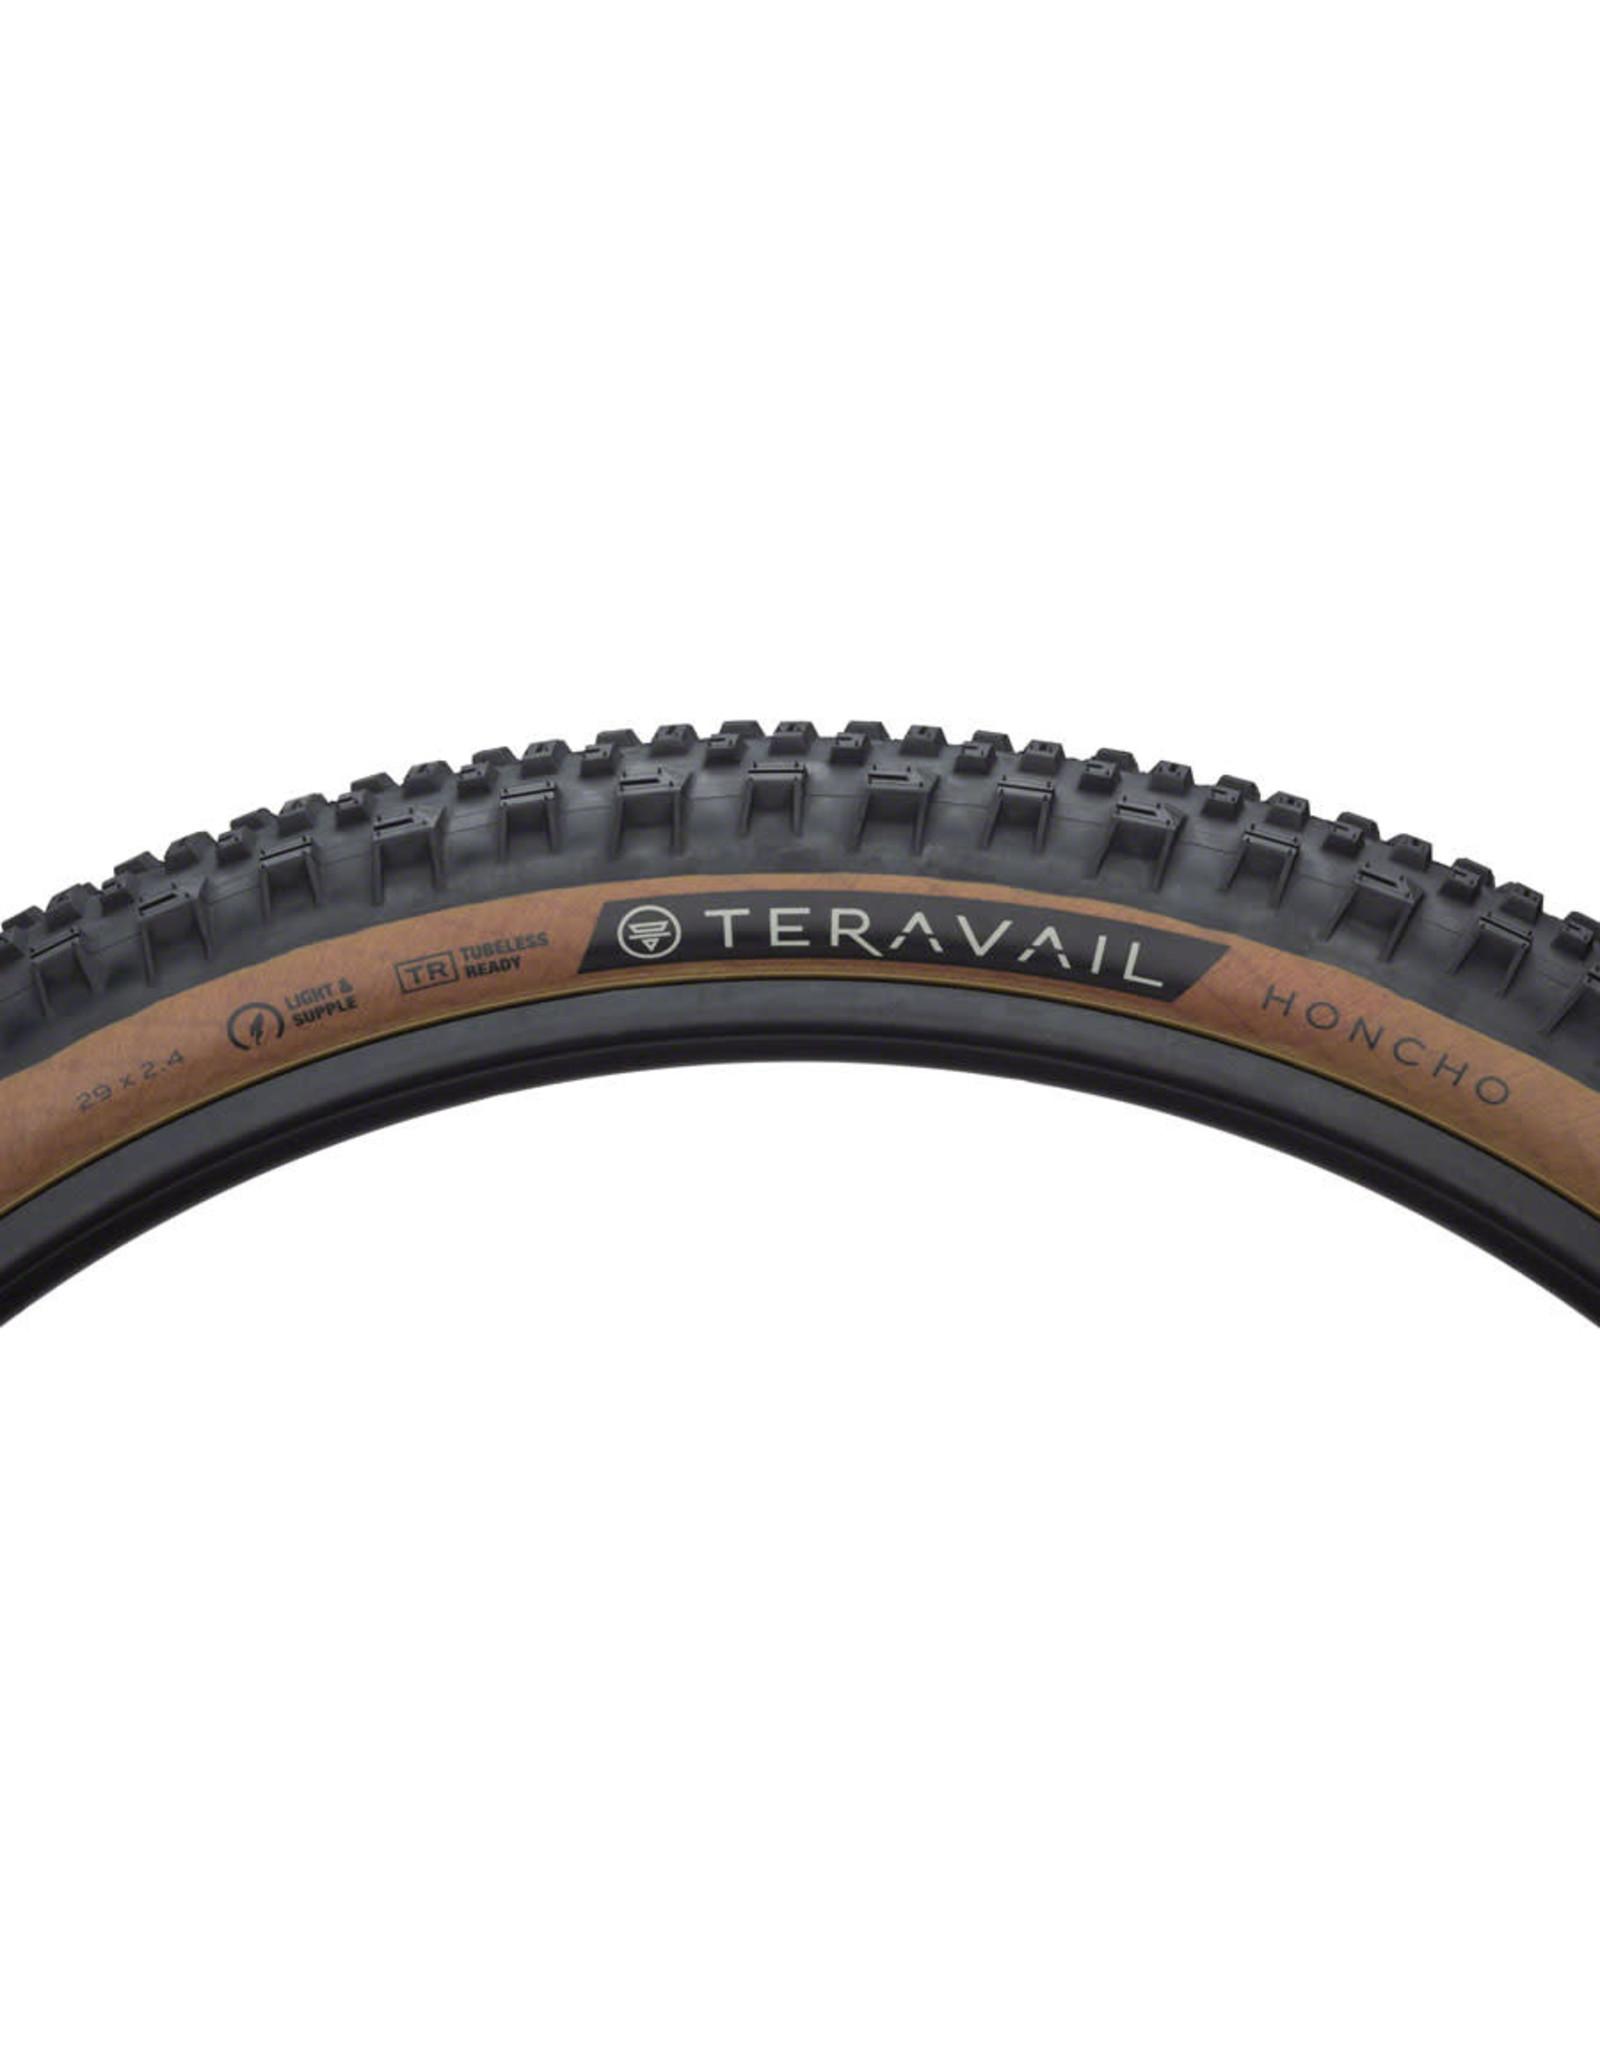 Teravail Teravail Honcho Tire - 29 x 2.4, Tubeless, Folding, Tan, Light and Supple